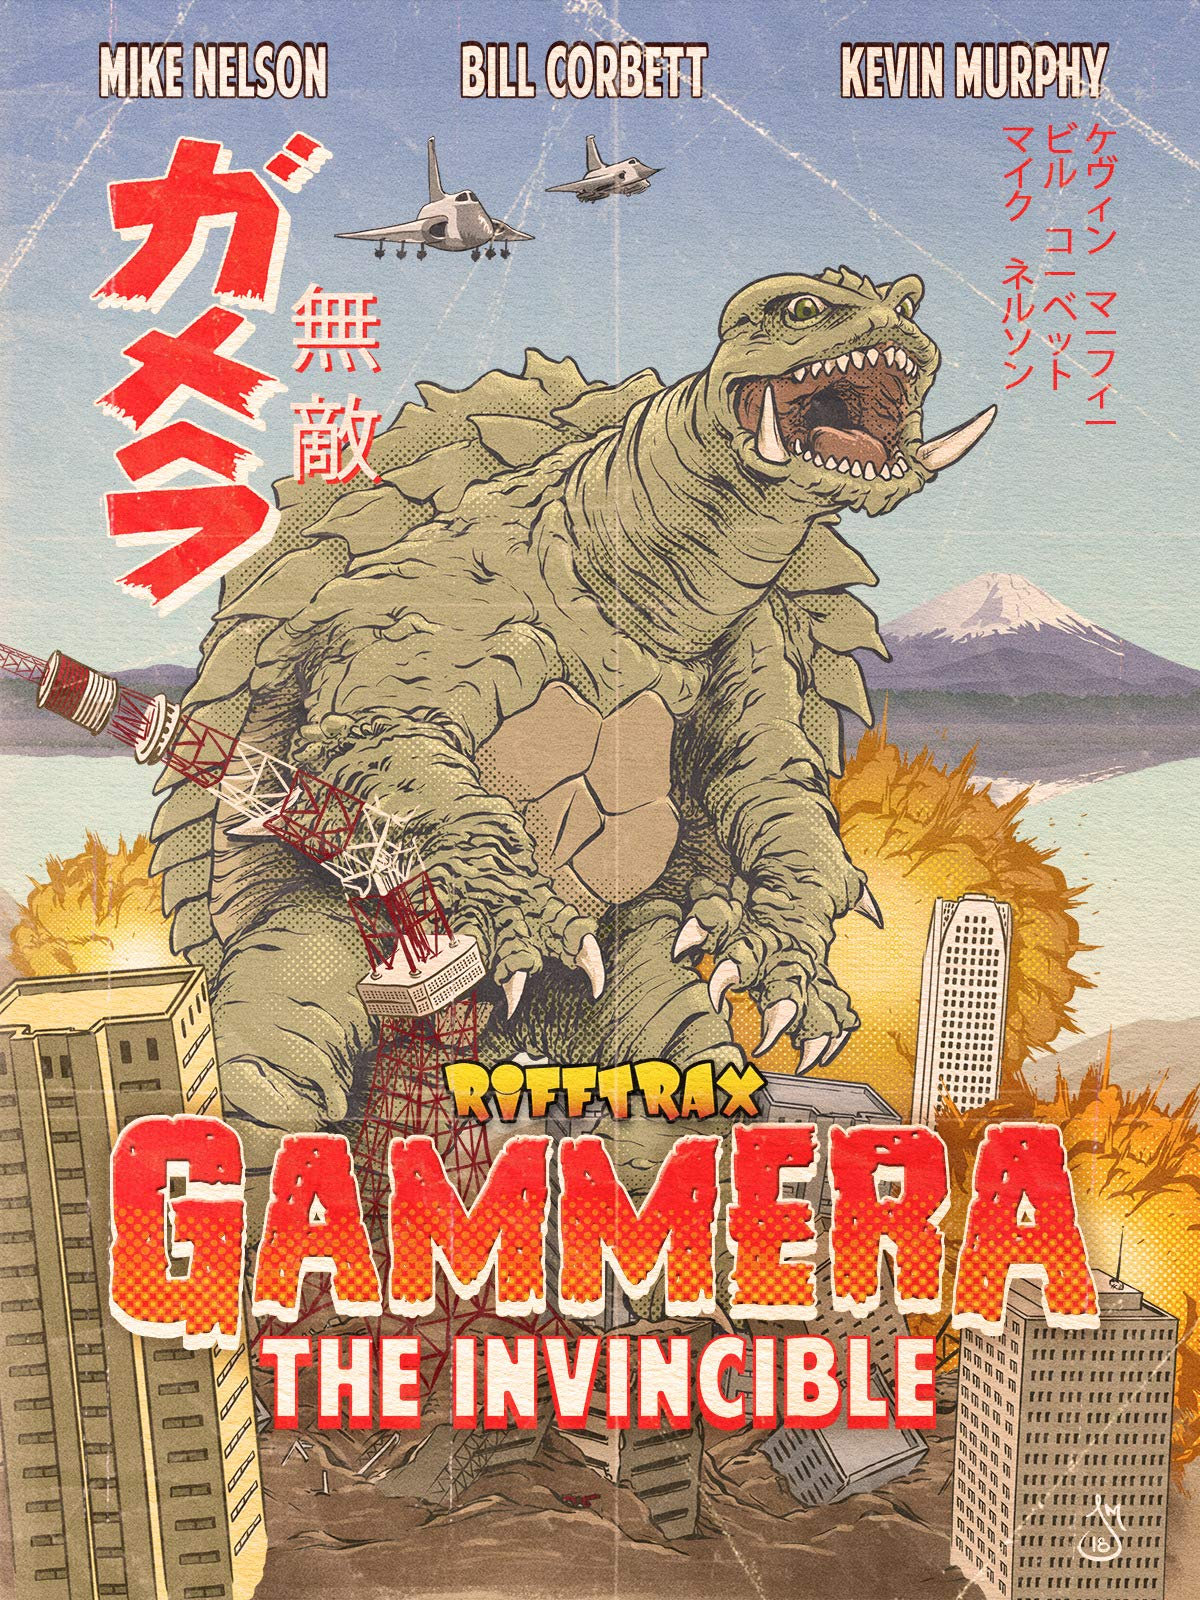 RiffTrax: Gammera the Invincible